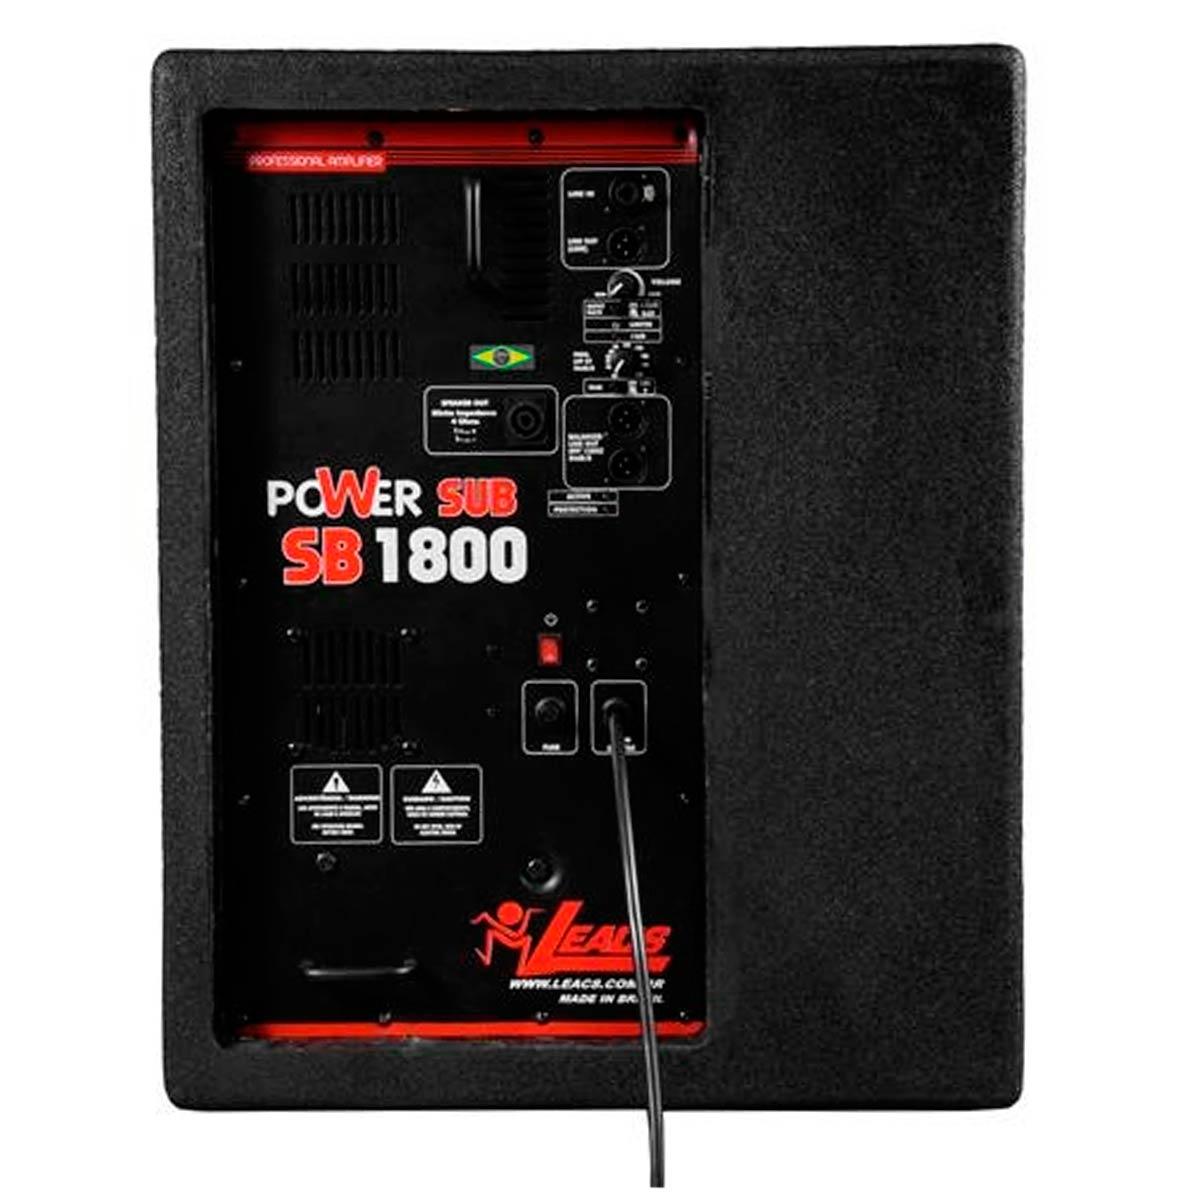 SB1800 - Subwoofer Ativo 1500W SB 1800 - Leacs